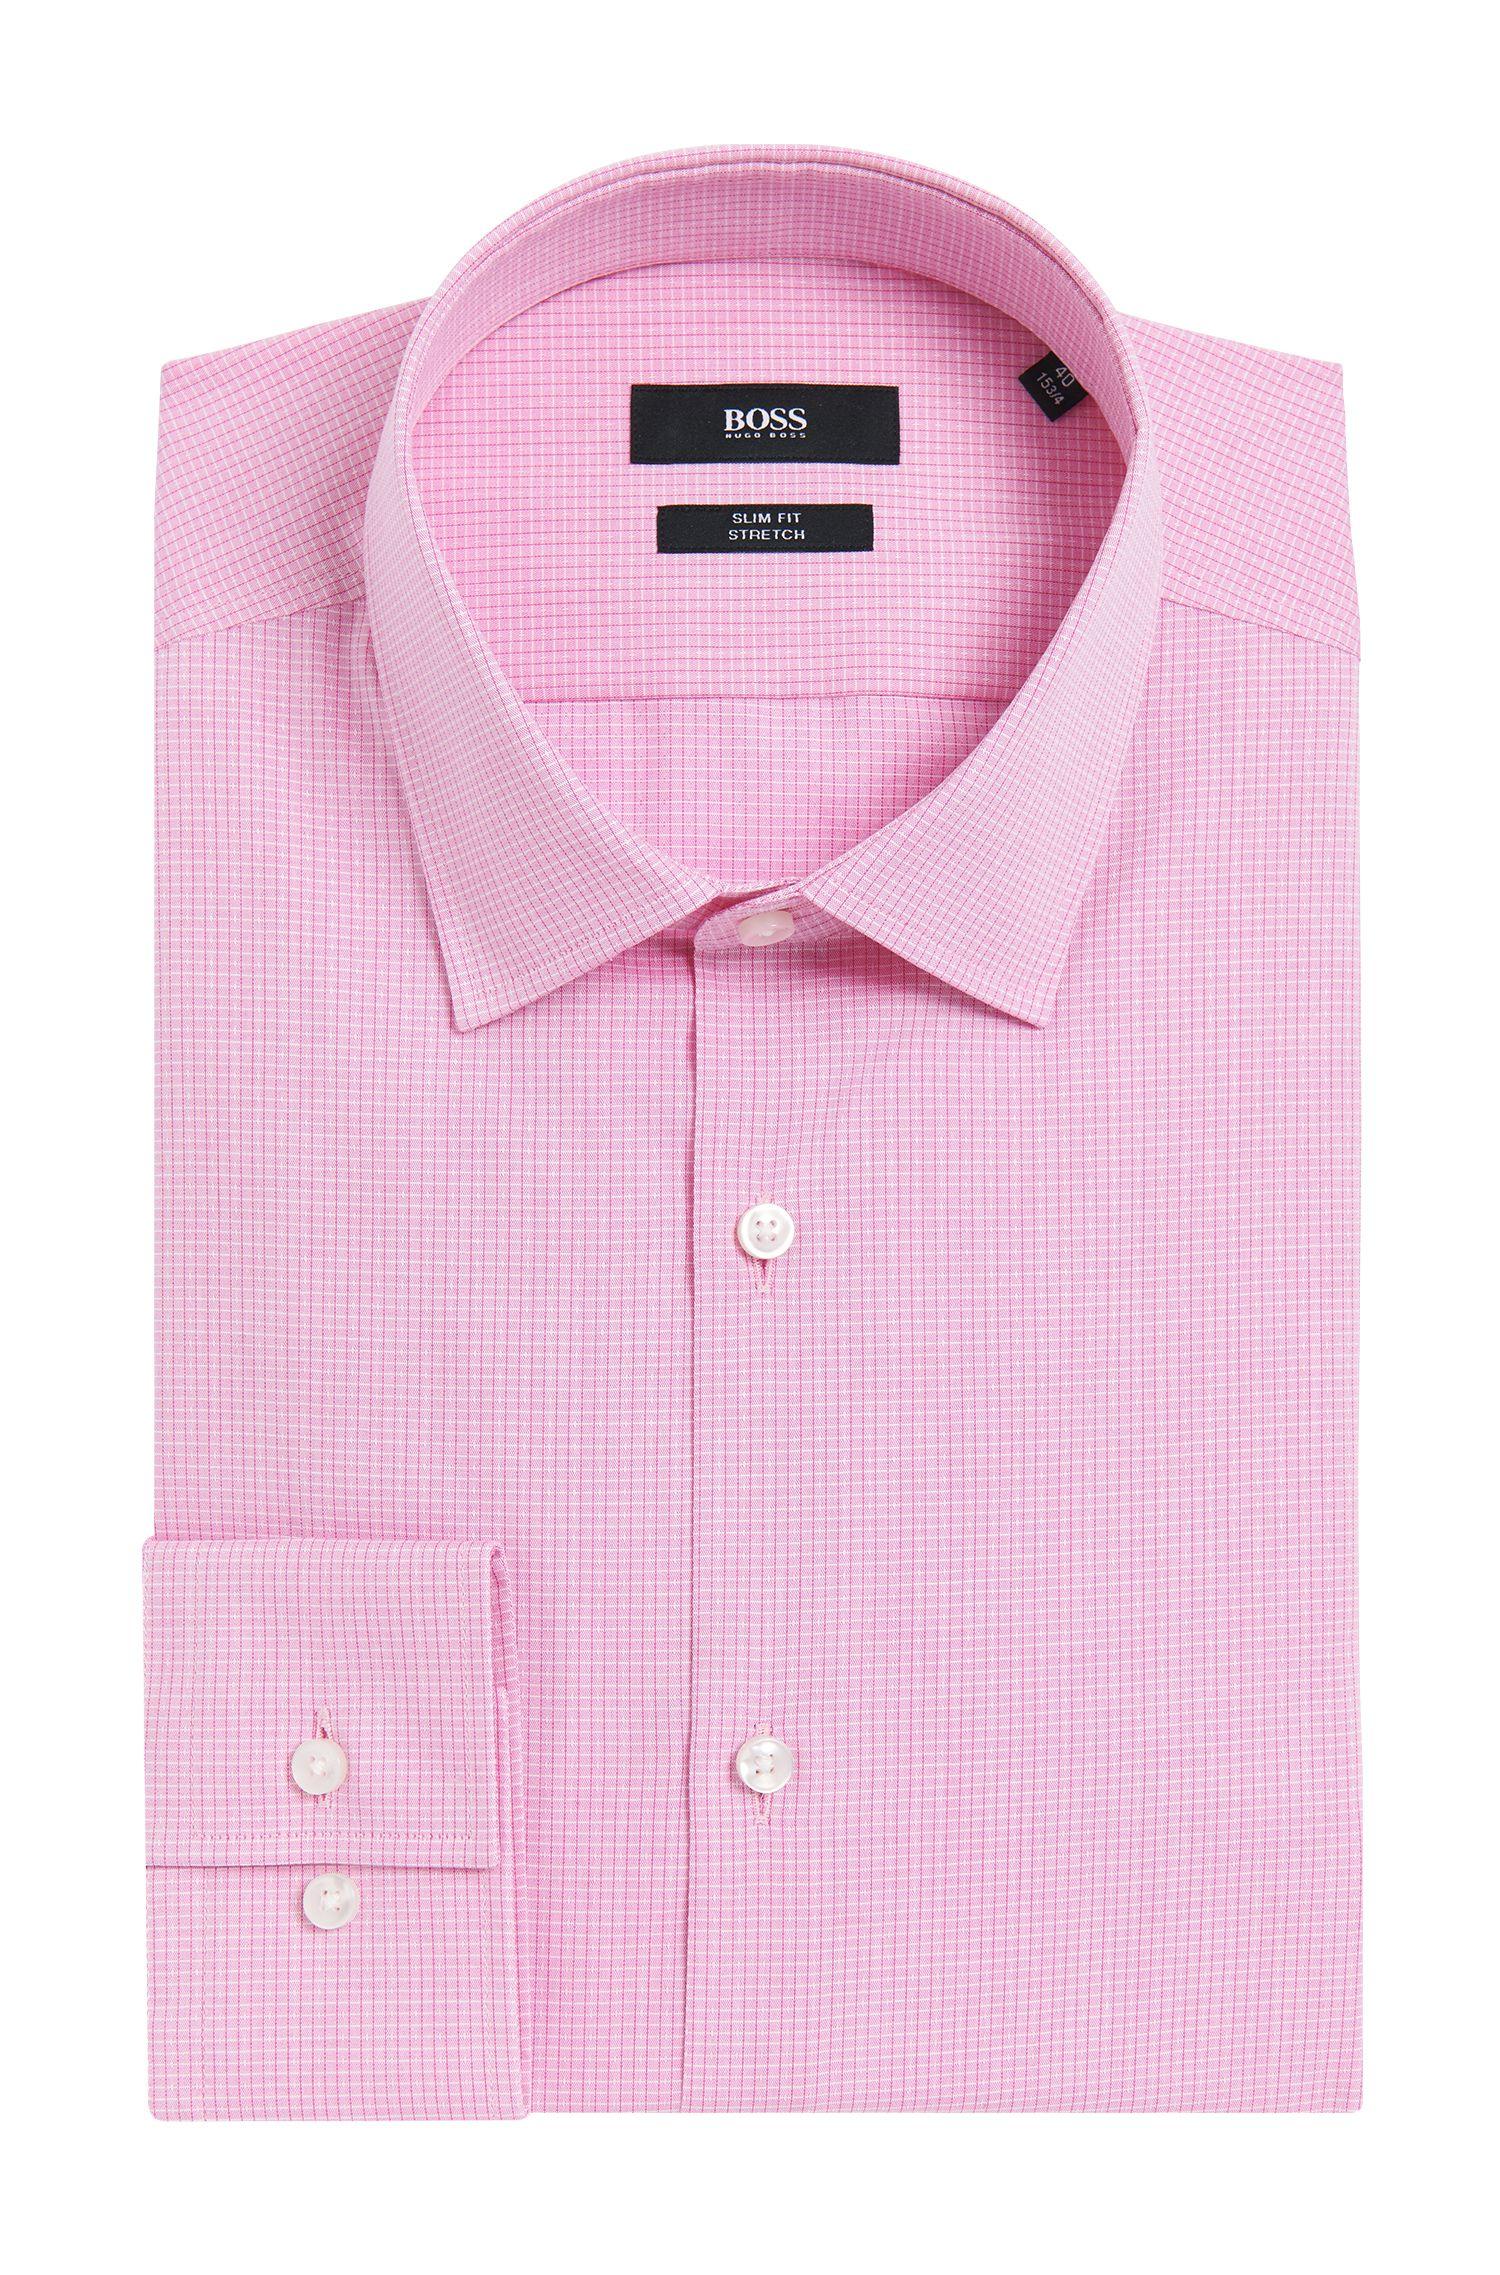 Tattersall Stretch Cotton Dress Shirt, Slim Fit | Jenno